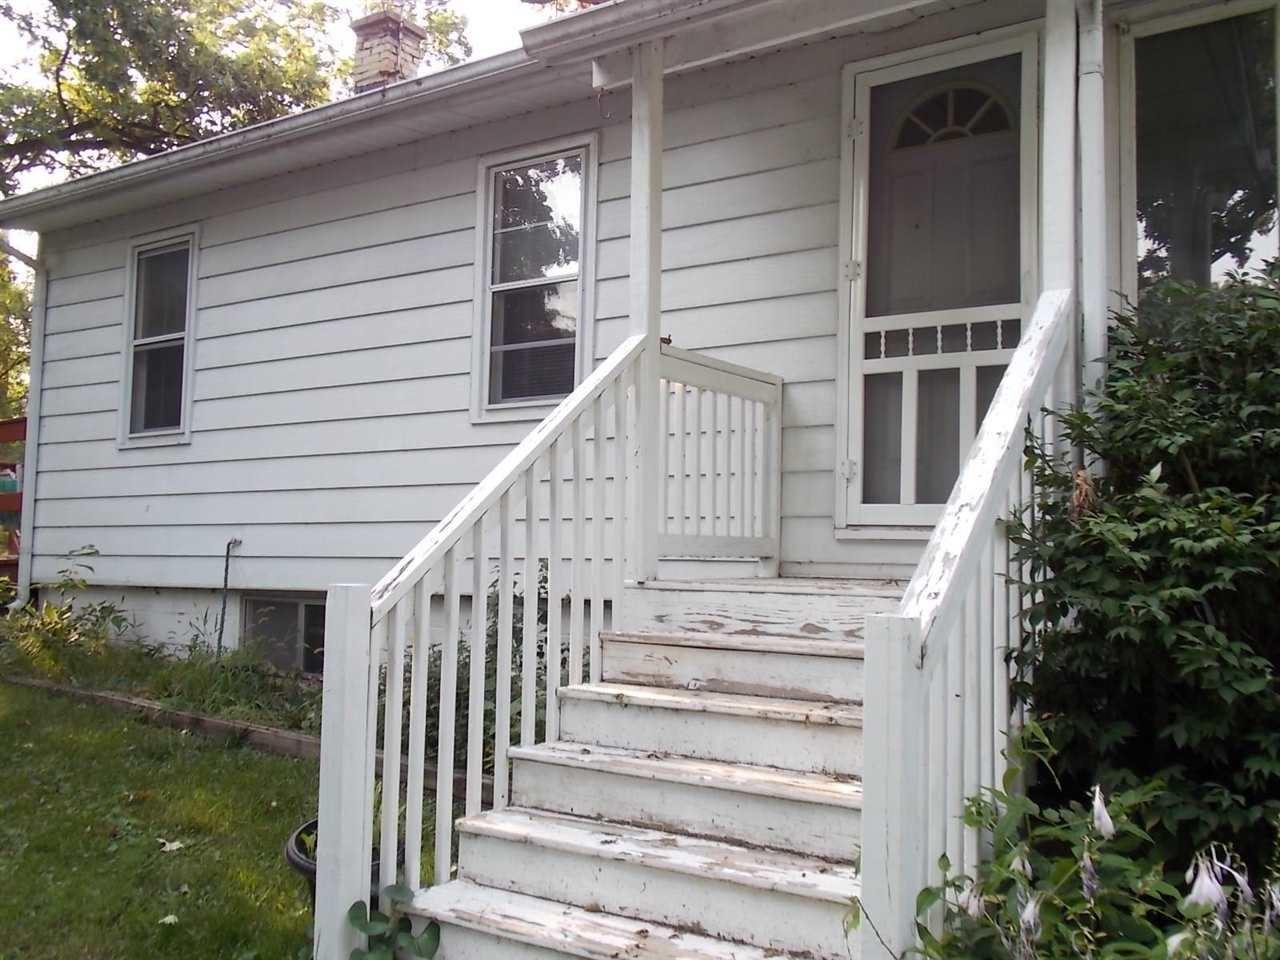 f_1915923_01 Real Estate in 53534 zip code